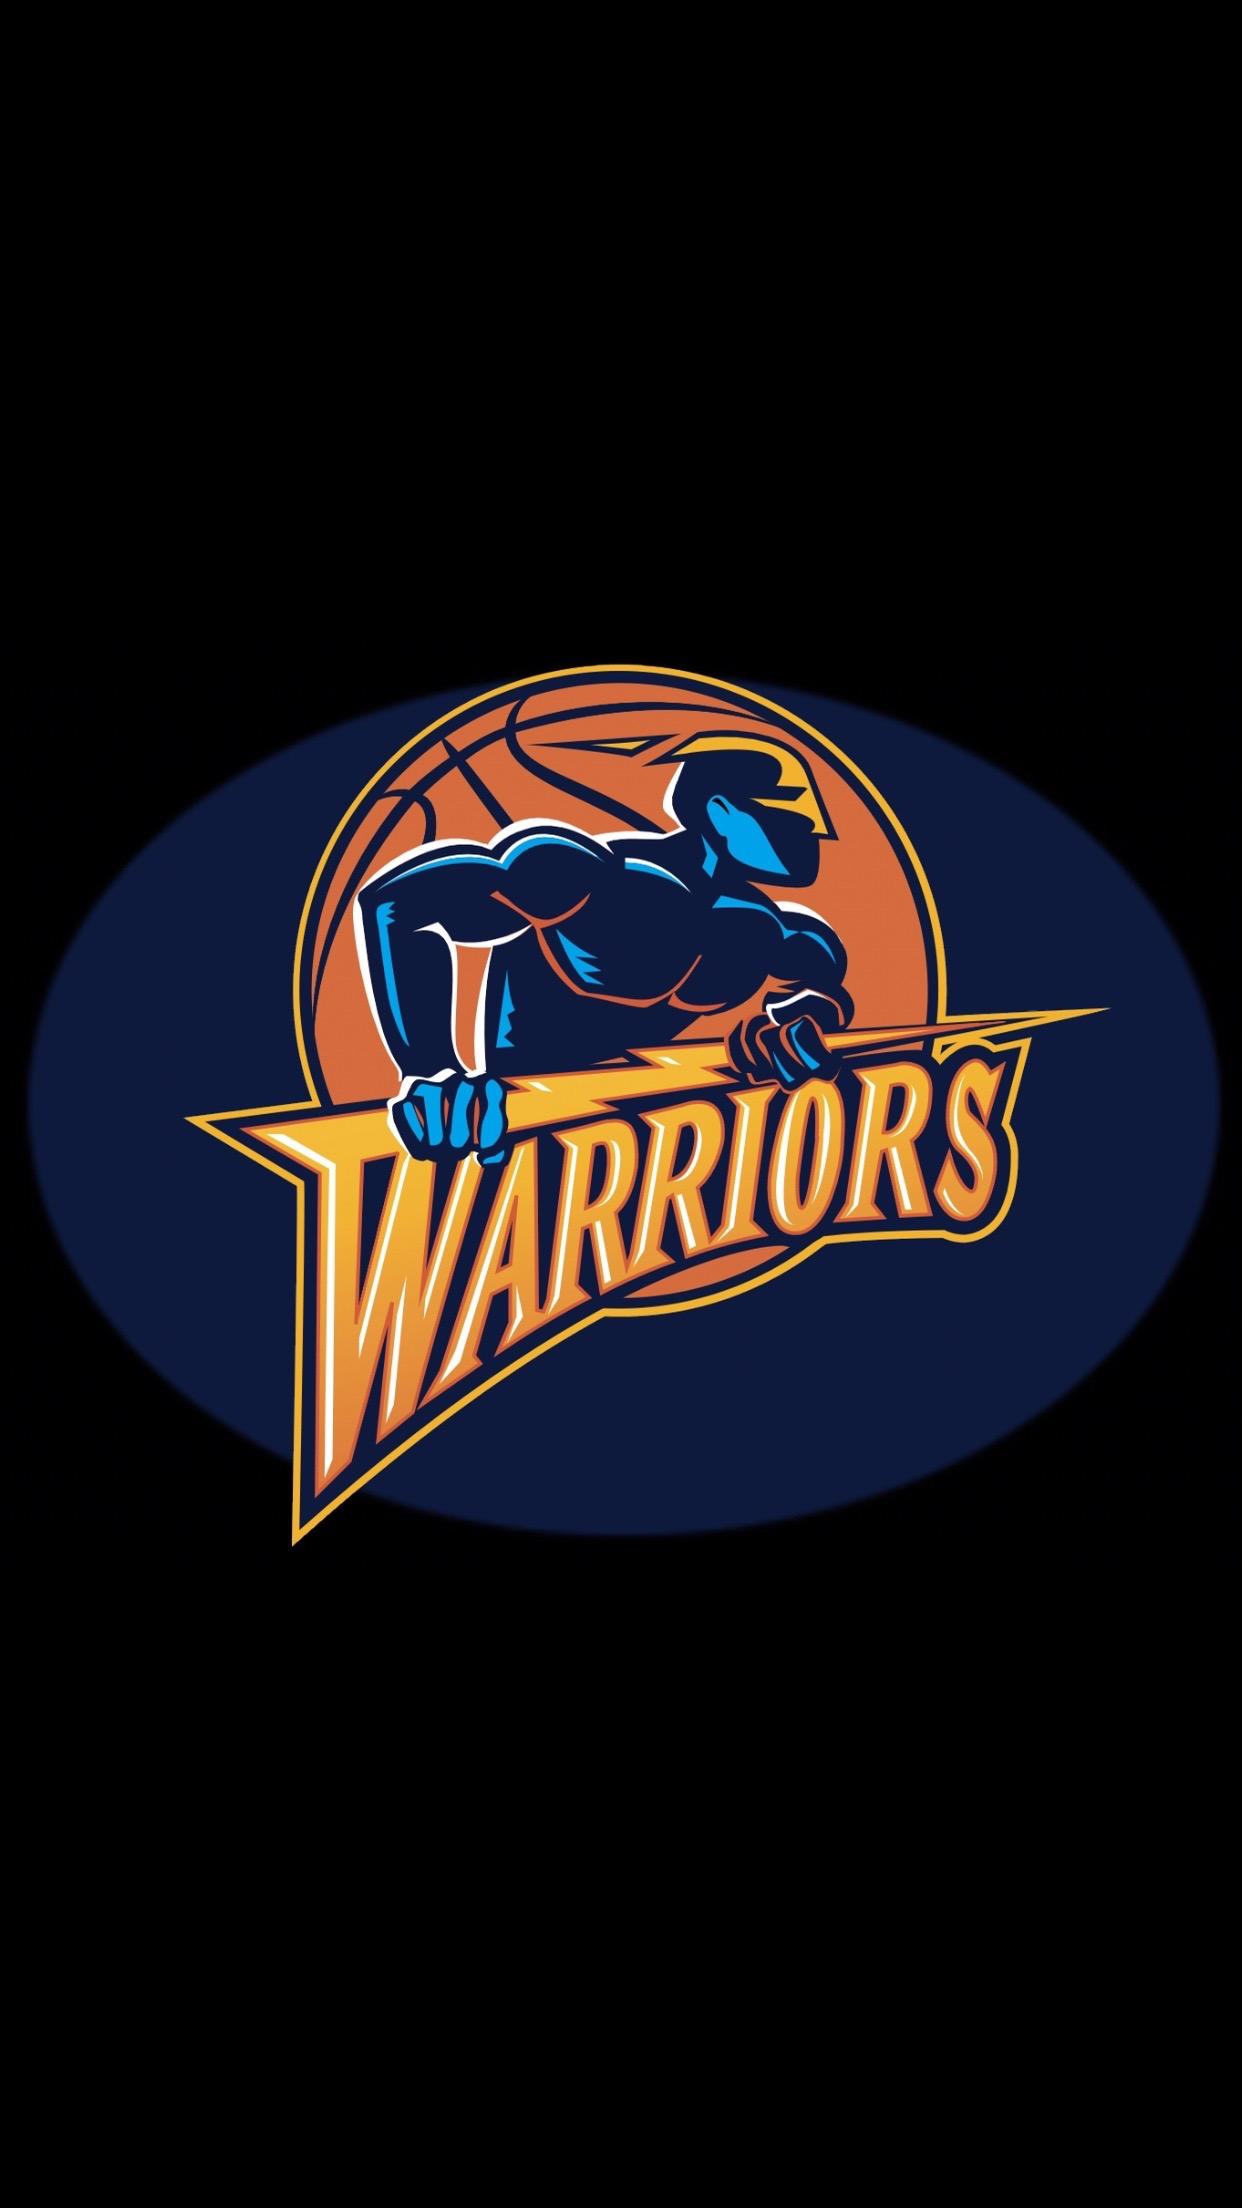 NBA Warriors Wallpaper for iPhone X, 8, 7, 6 - Free ...